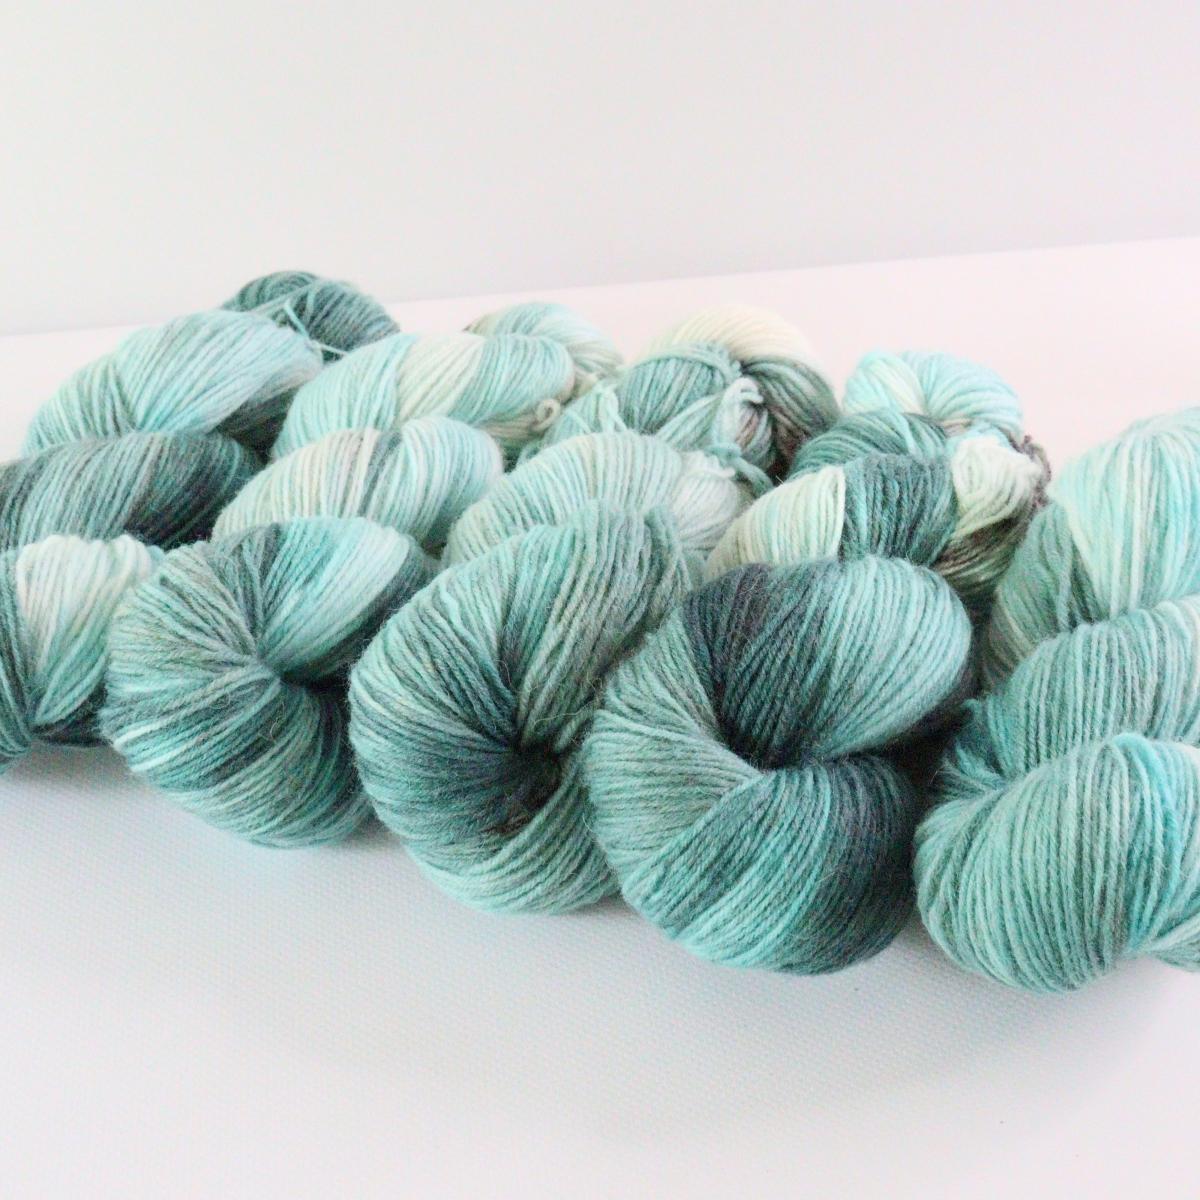 woodico.pro hand dyed yarn 074 4 1200x1200 - Hand dyed yarn / 074